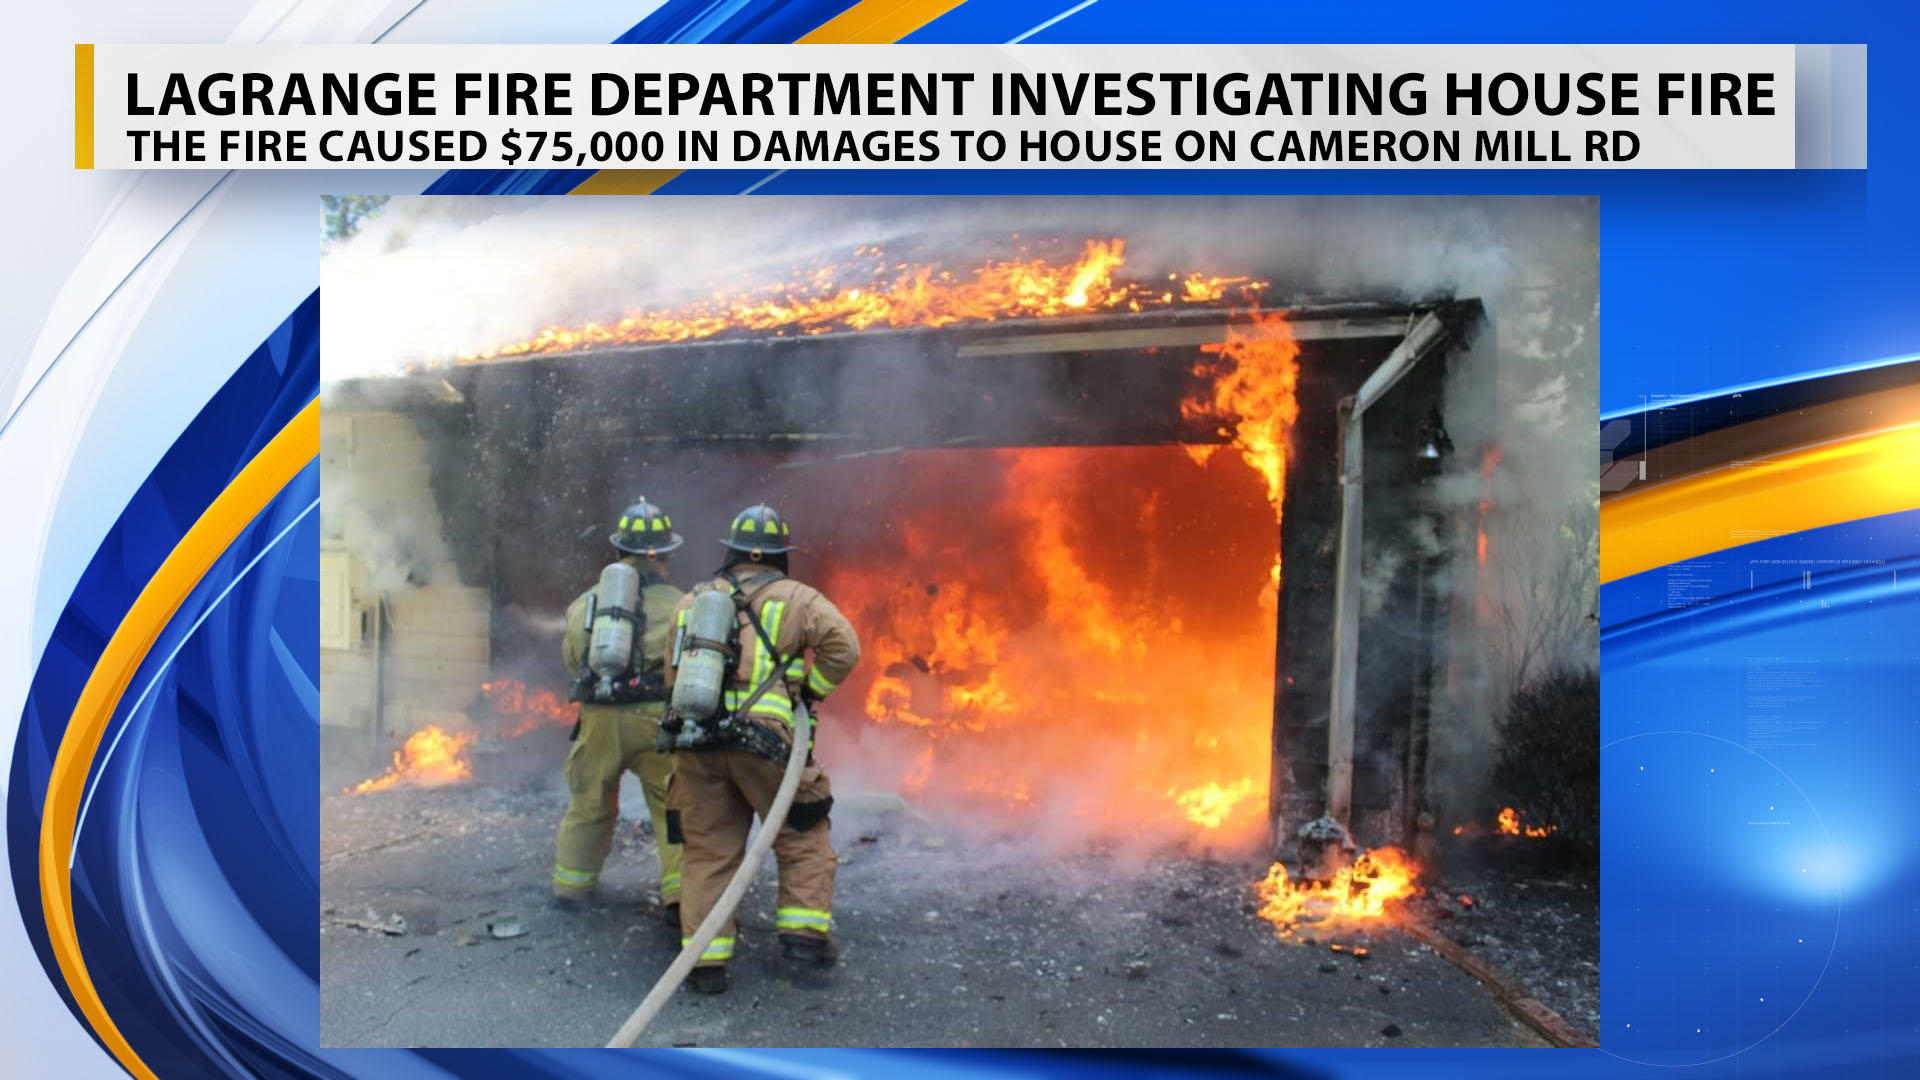 LFD Cameron Mill Fire pic1 branded_1560547839580.jpg.jpg